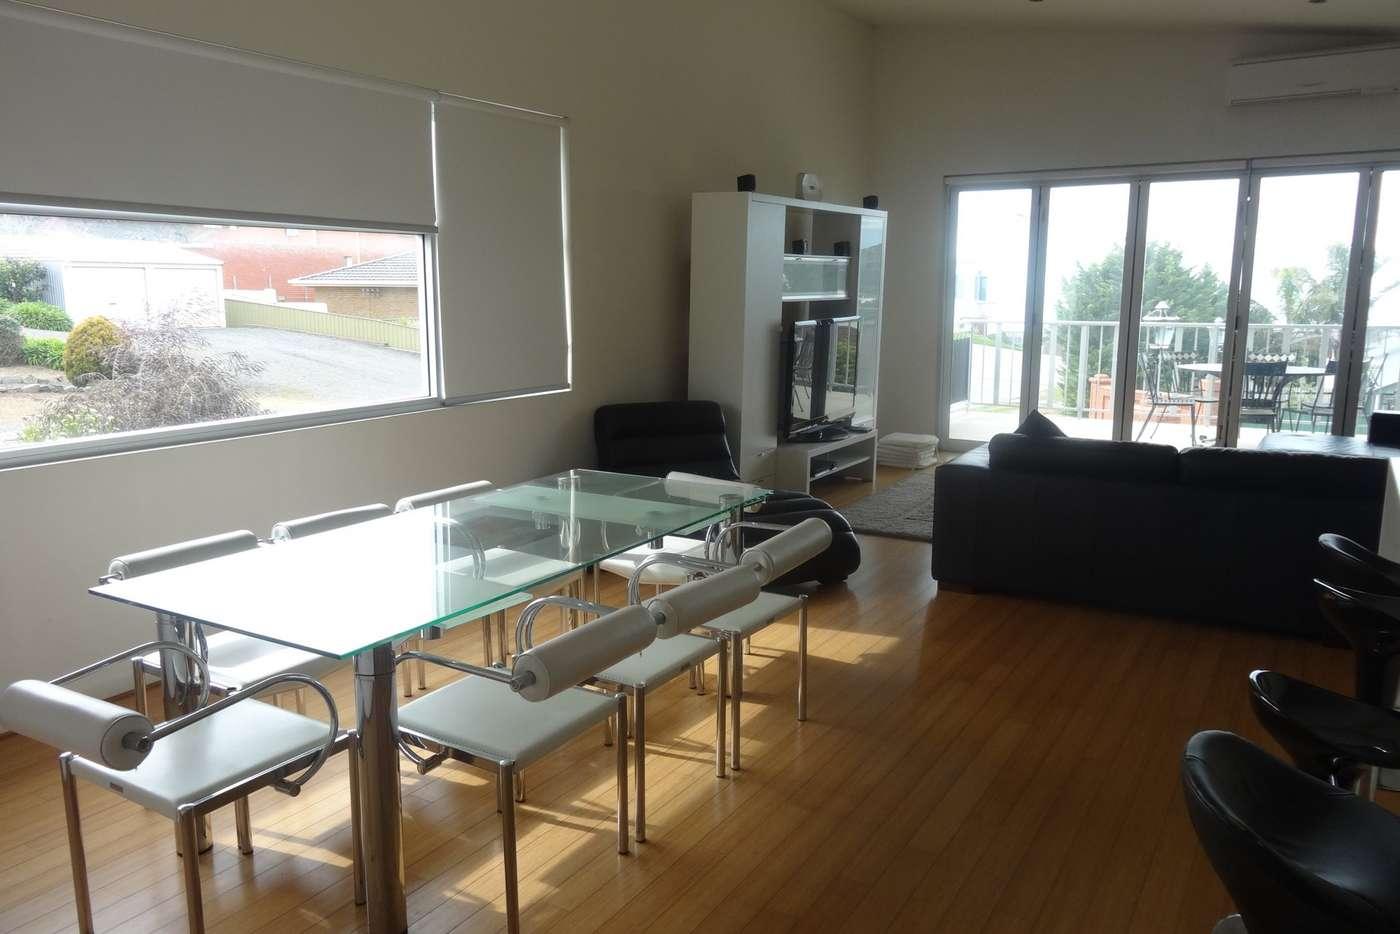 Sixth view of Homely house listing, 47 Battye Rd, Encounter Bay SA 5211